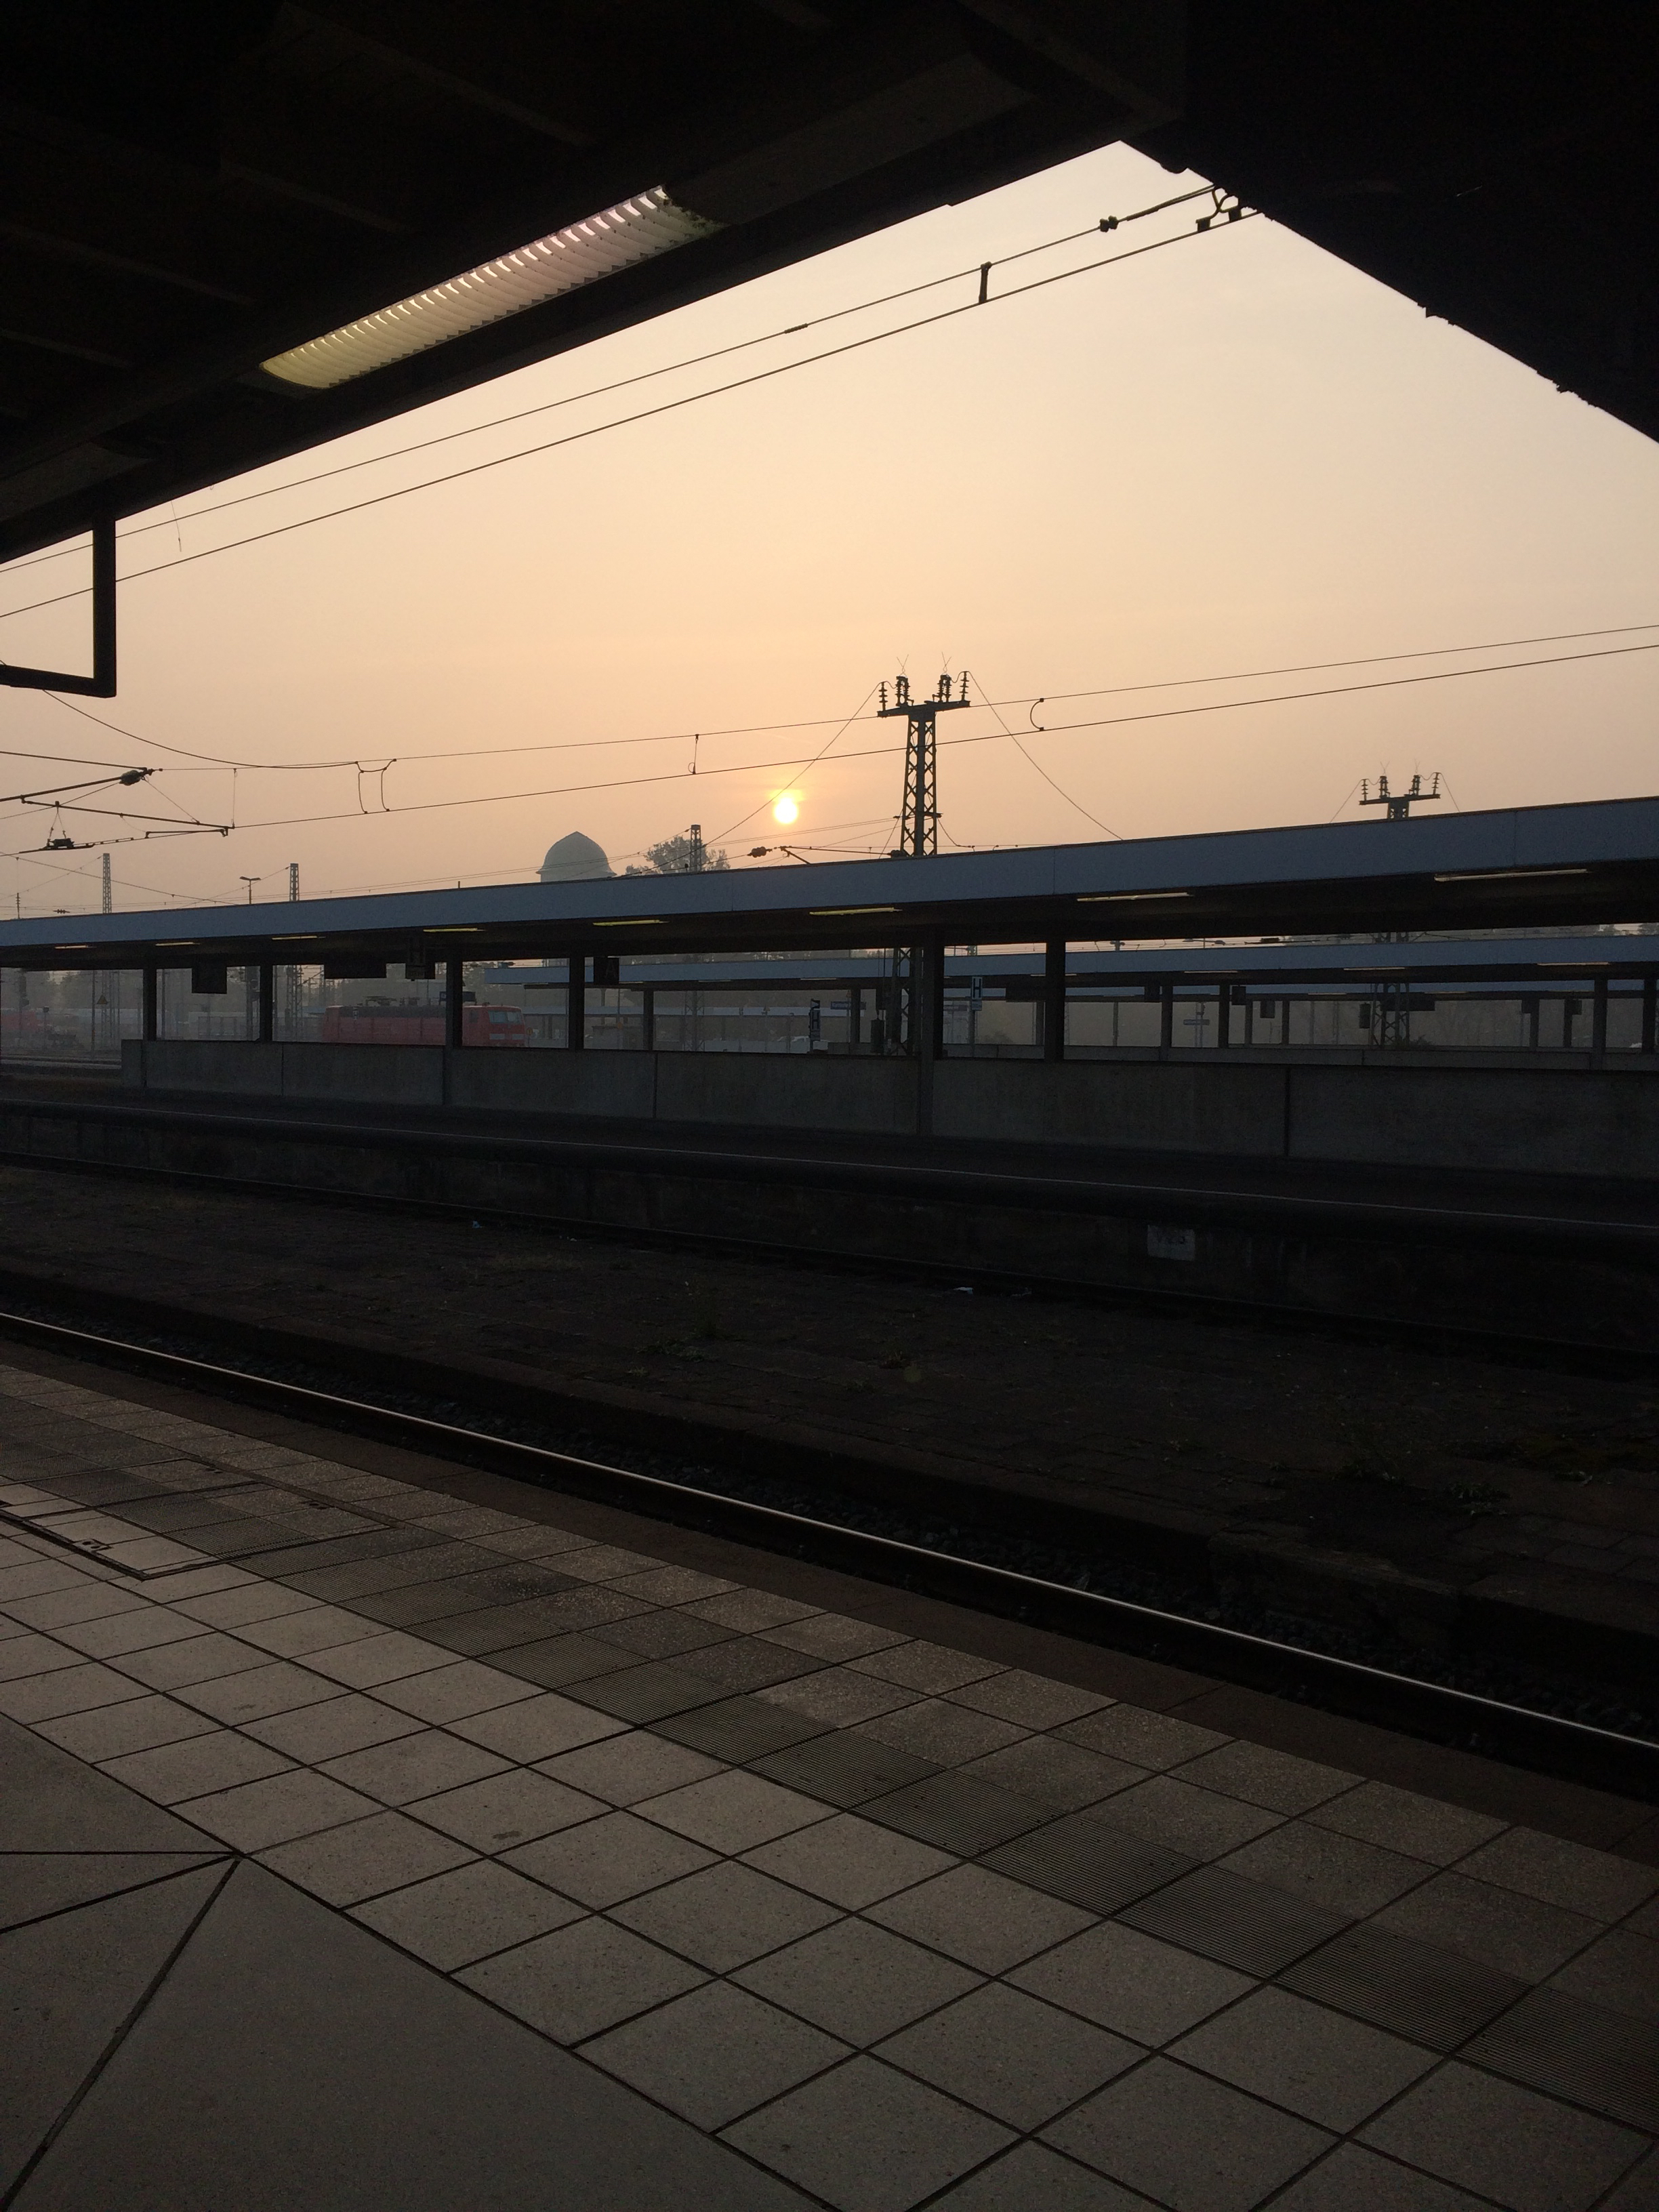 Sonnenuntergang an einem leeren Bahnhof